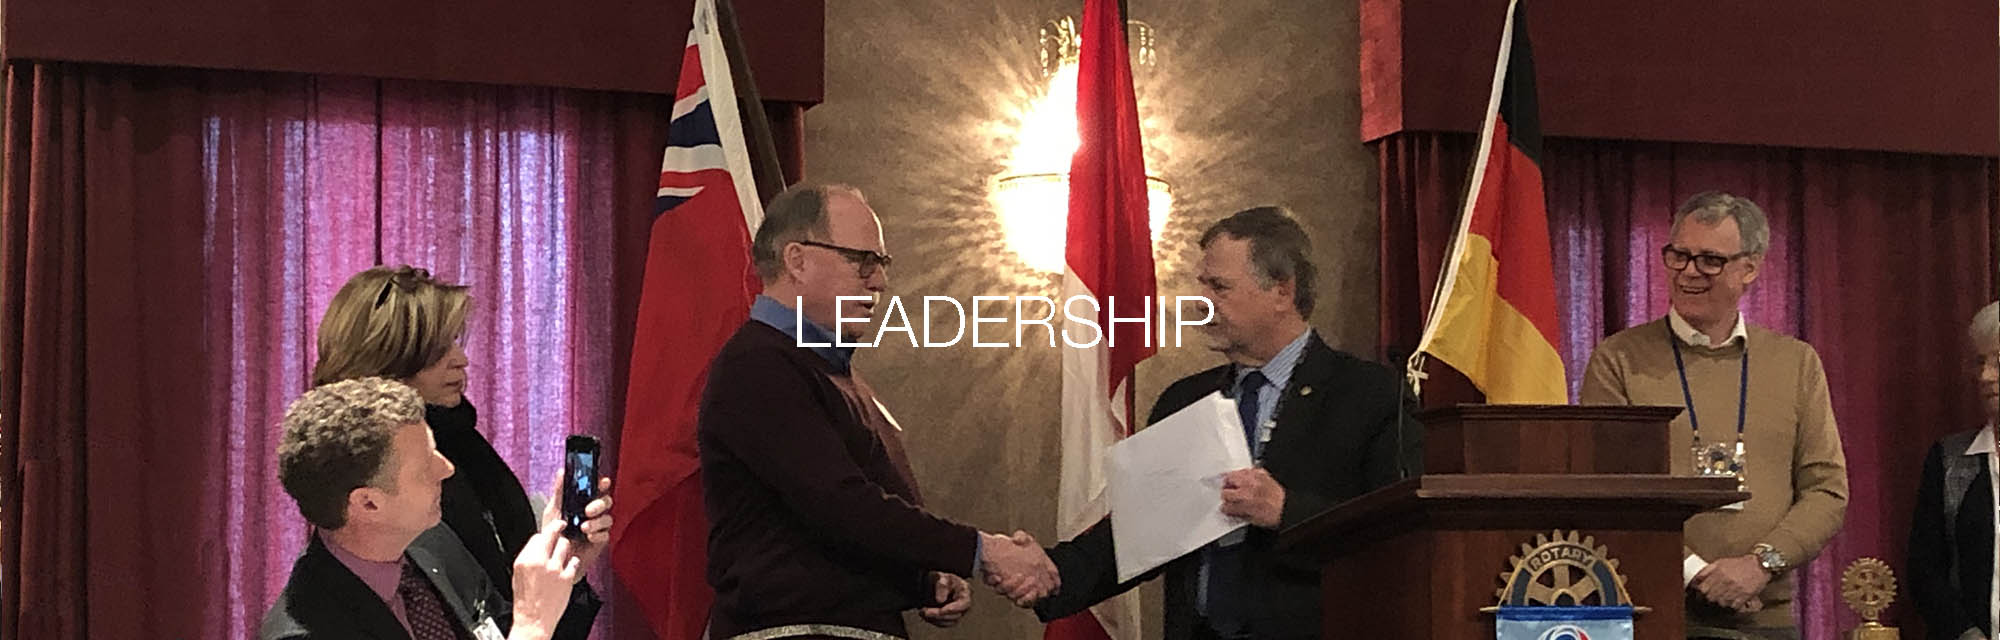 Cobourg Rotary Leadership